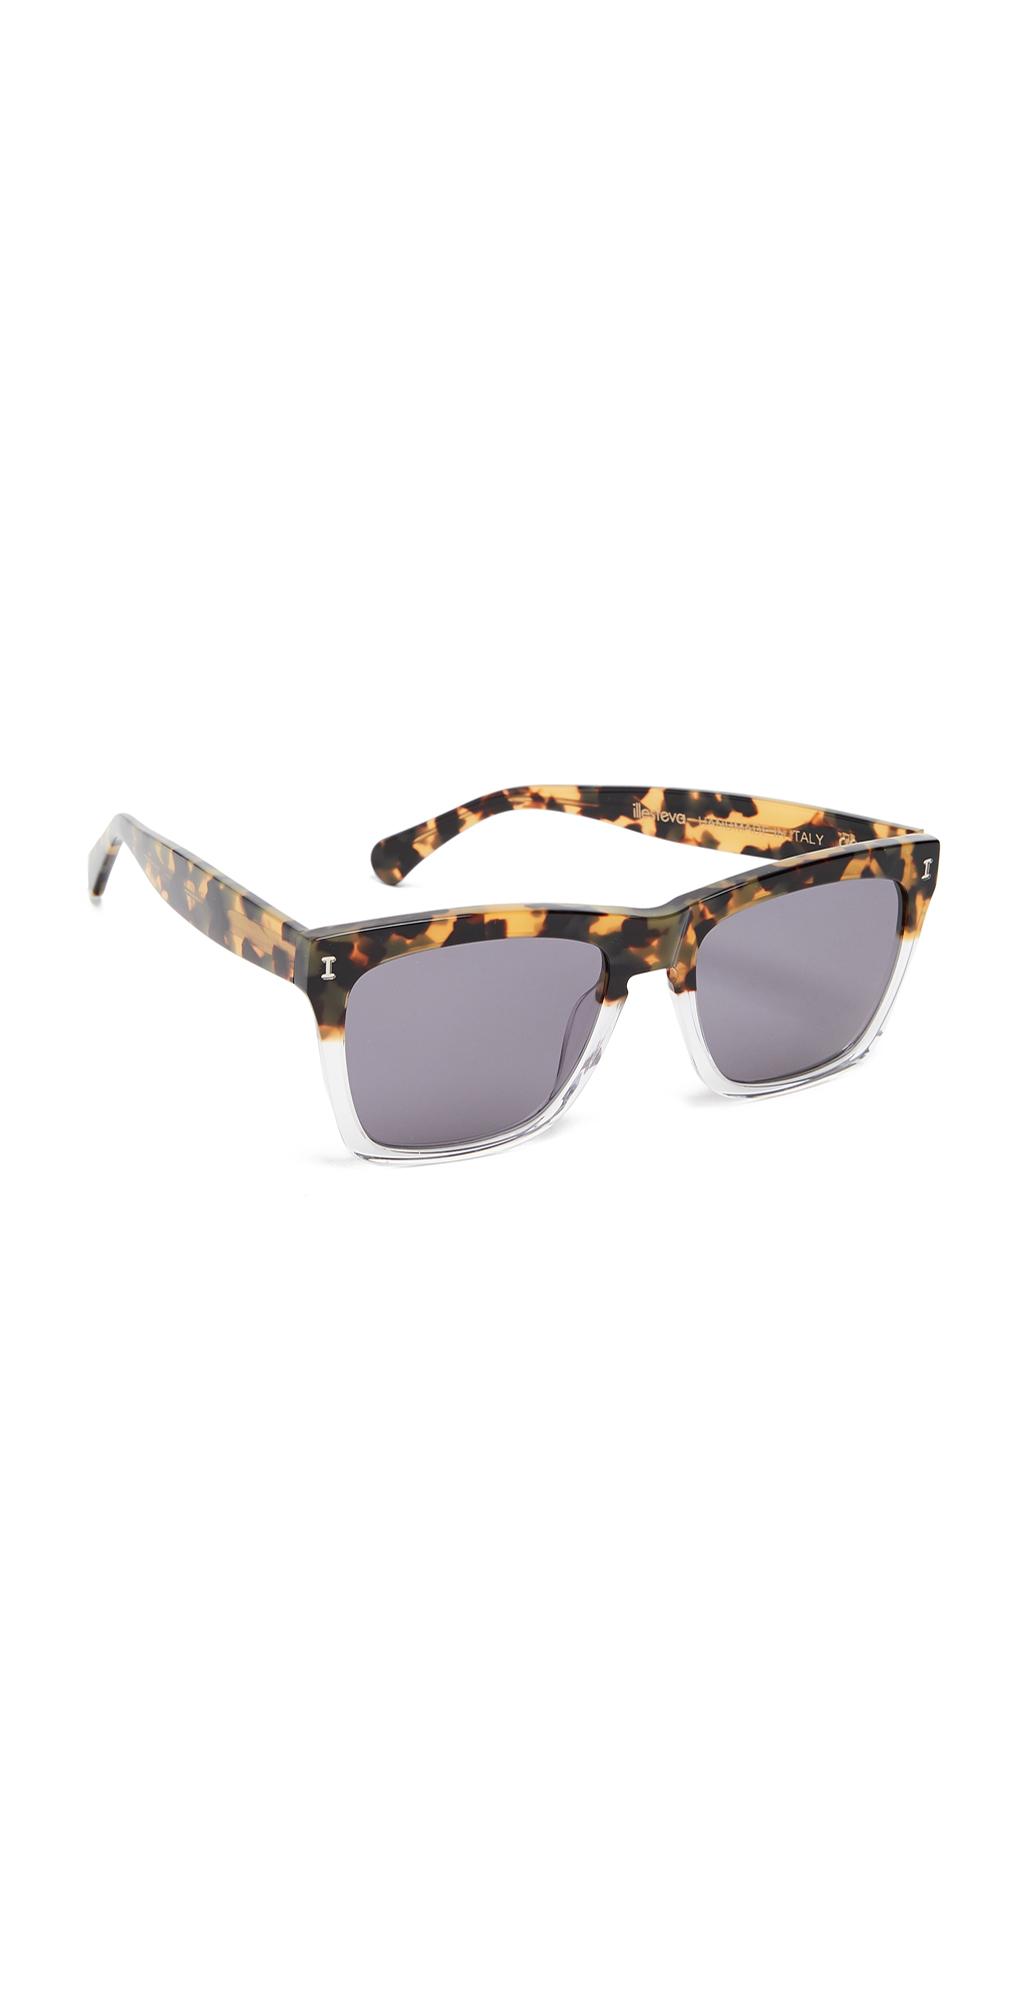 Los Feliz Sunglasses